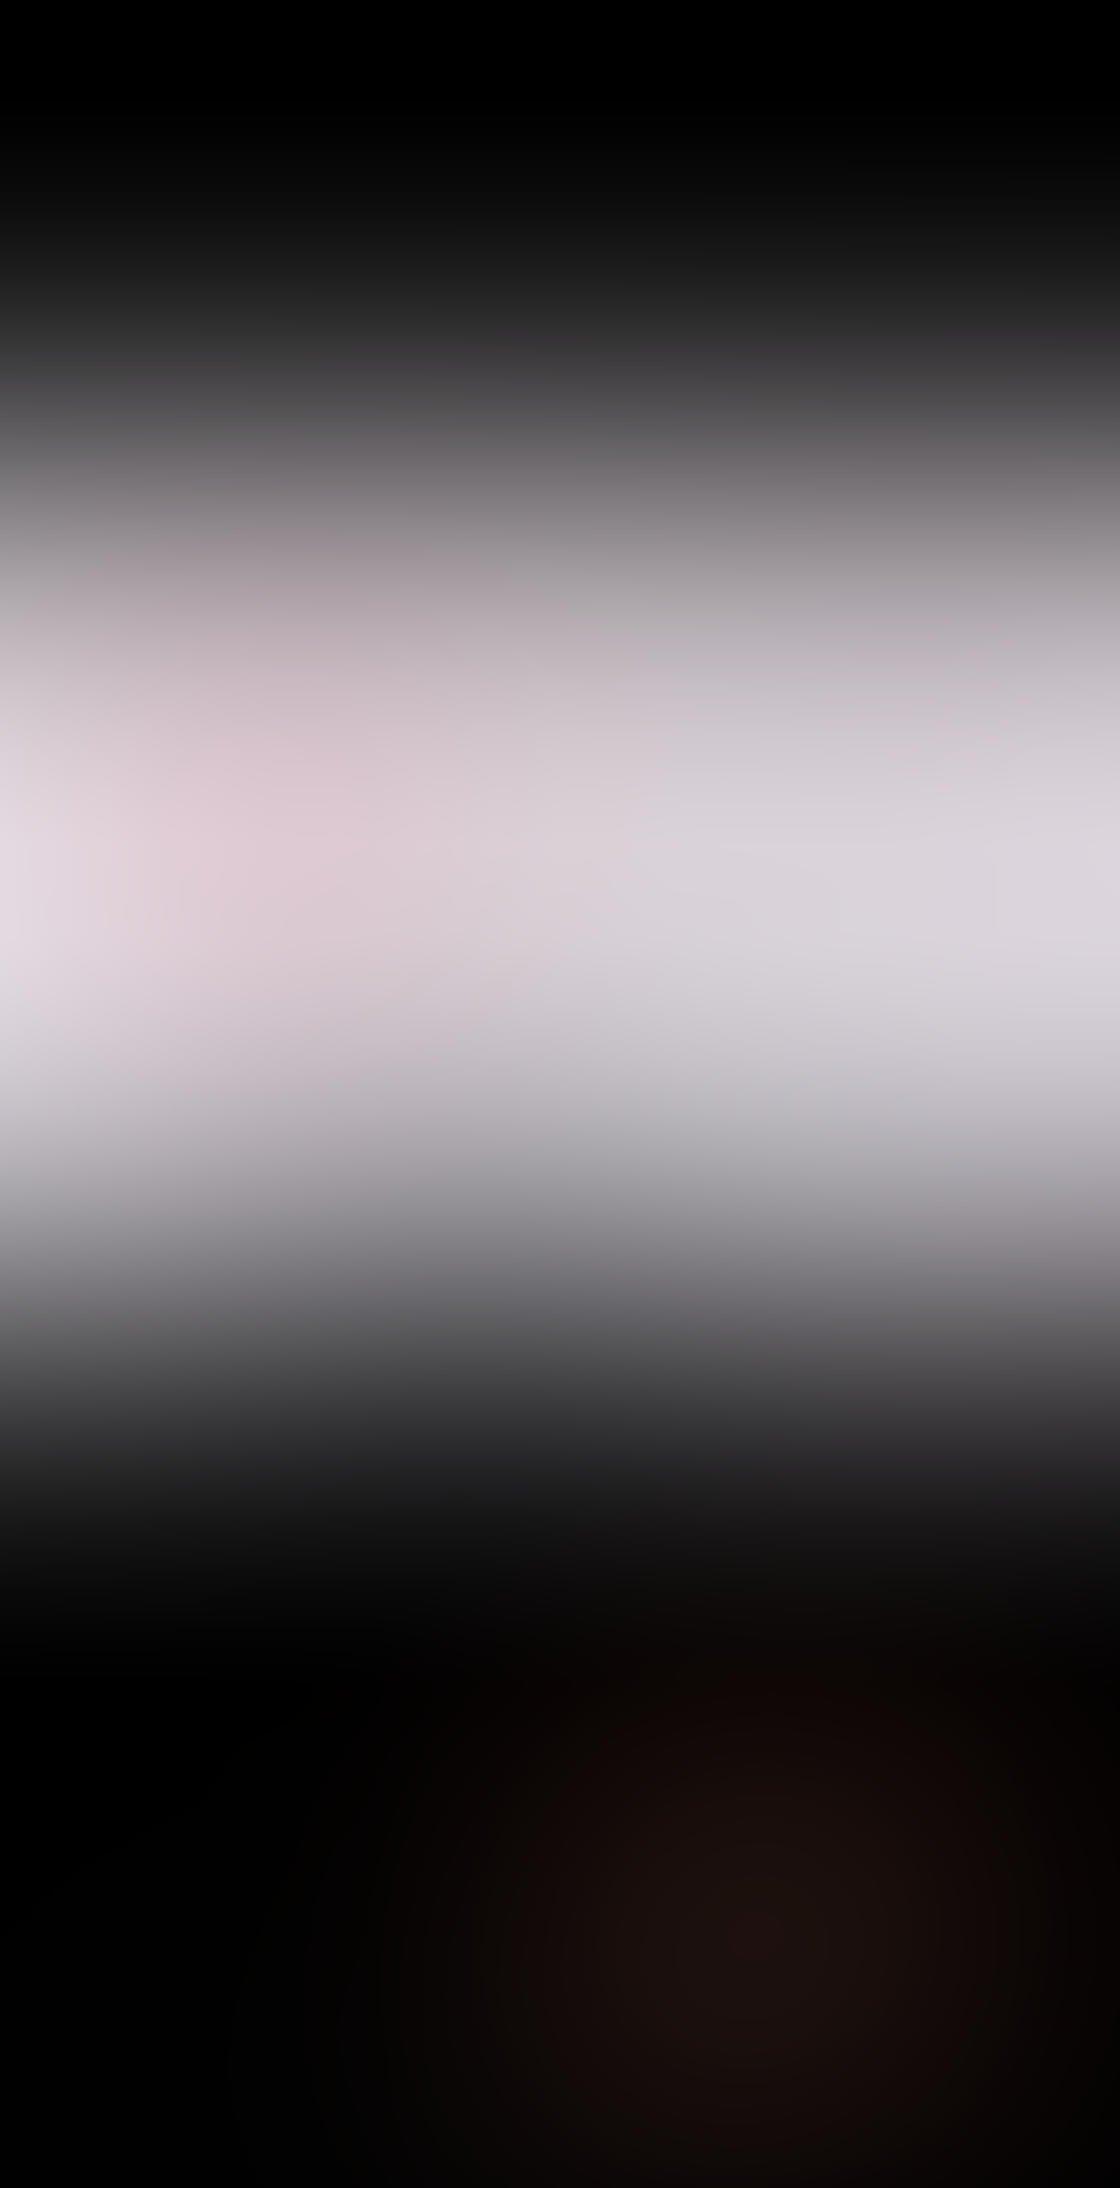 Vsco filters 7